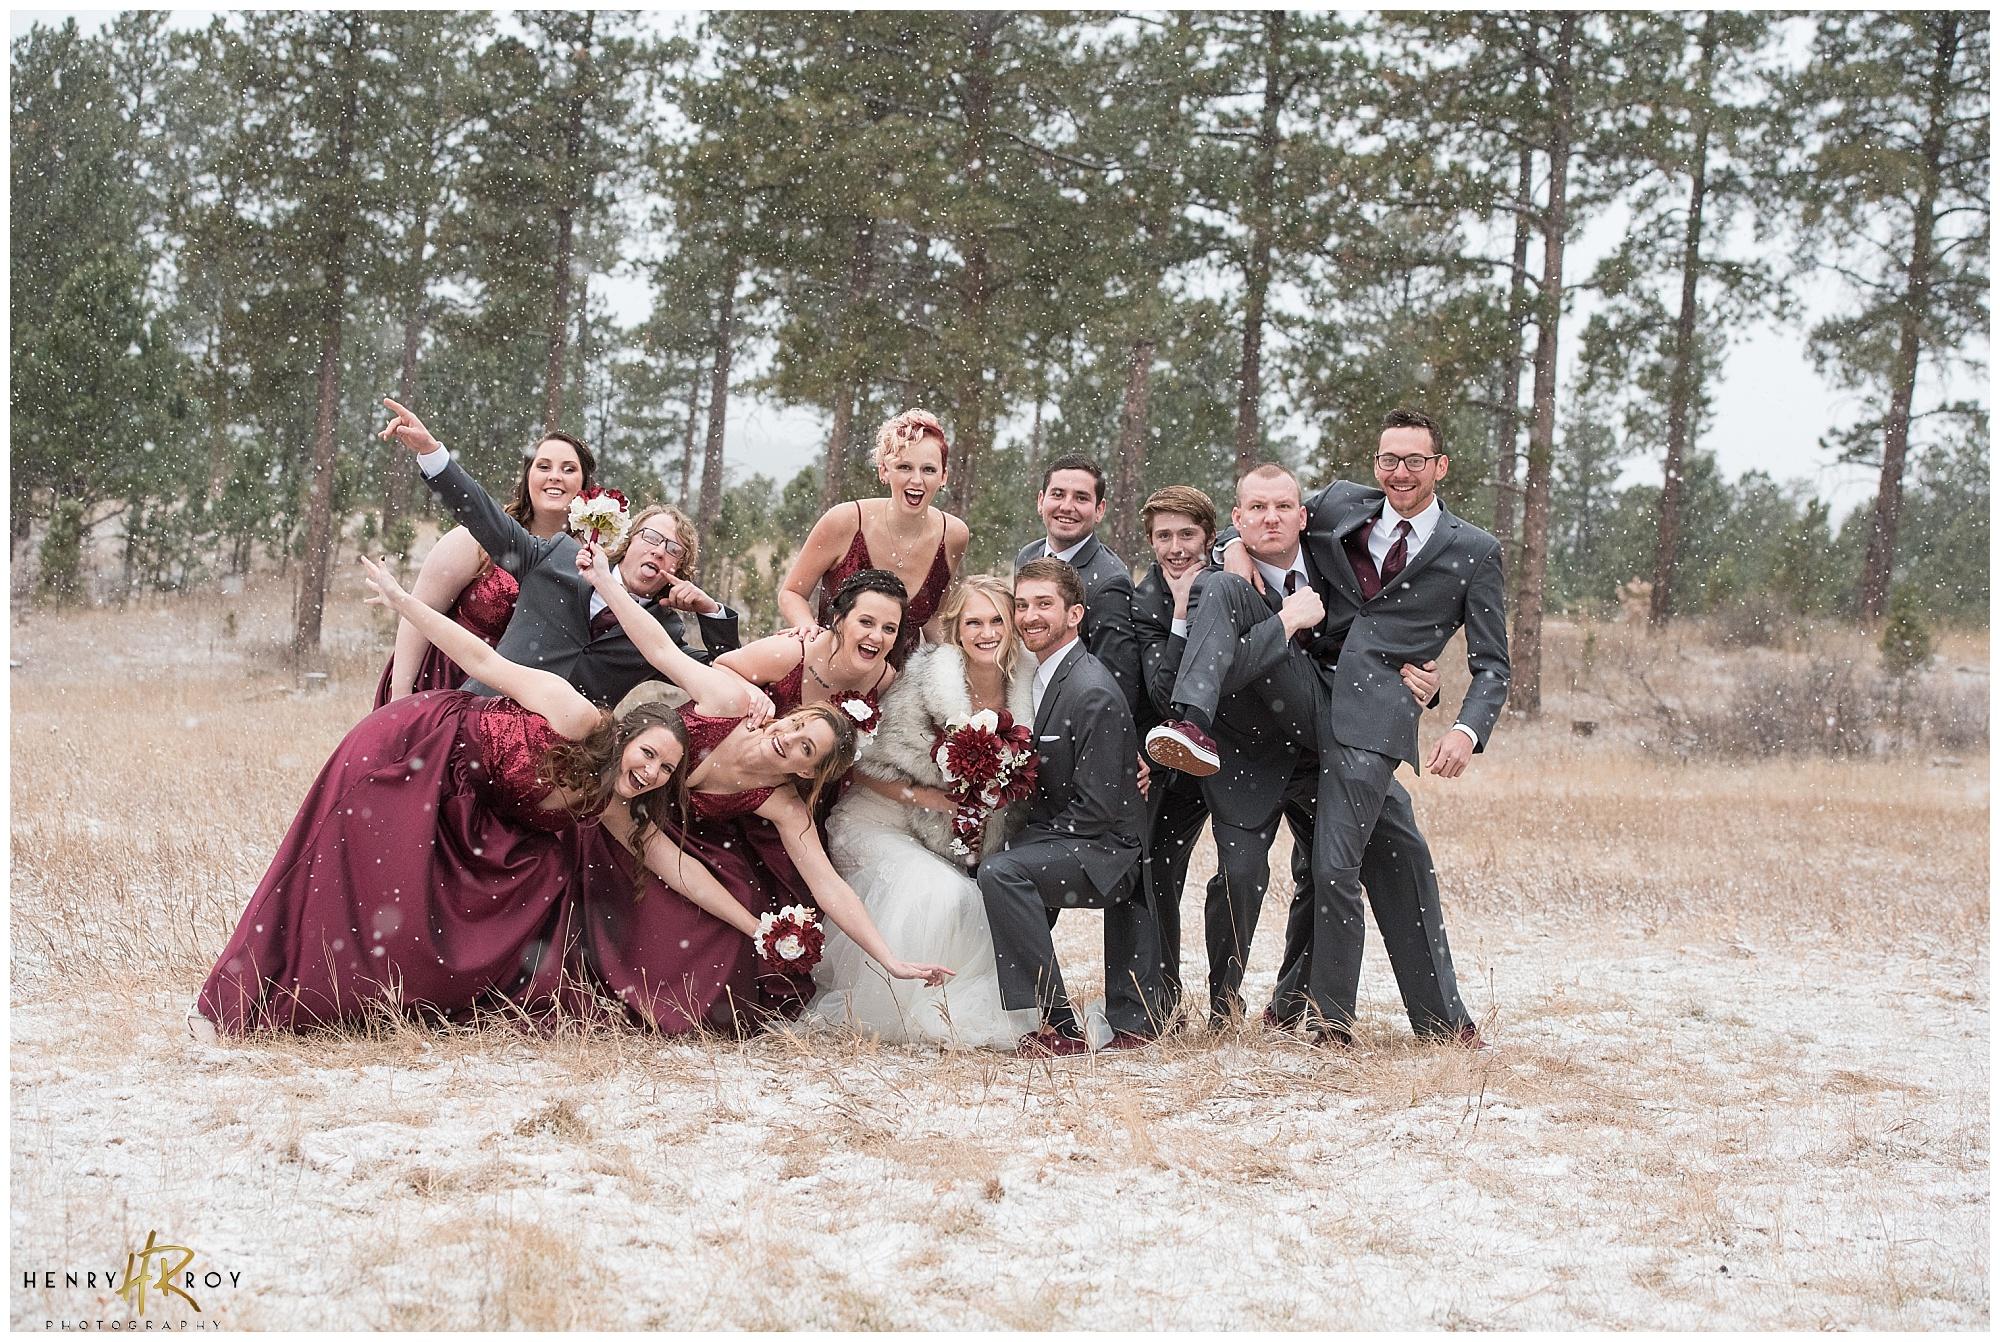 WEDDING PHOTOGRAPHER0030.jpg